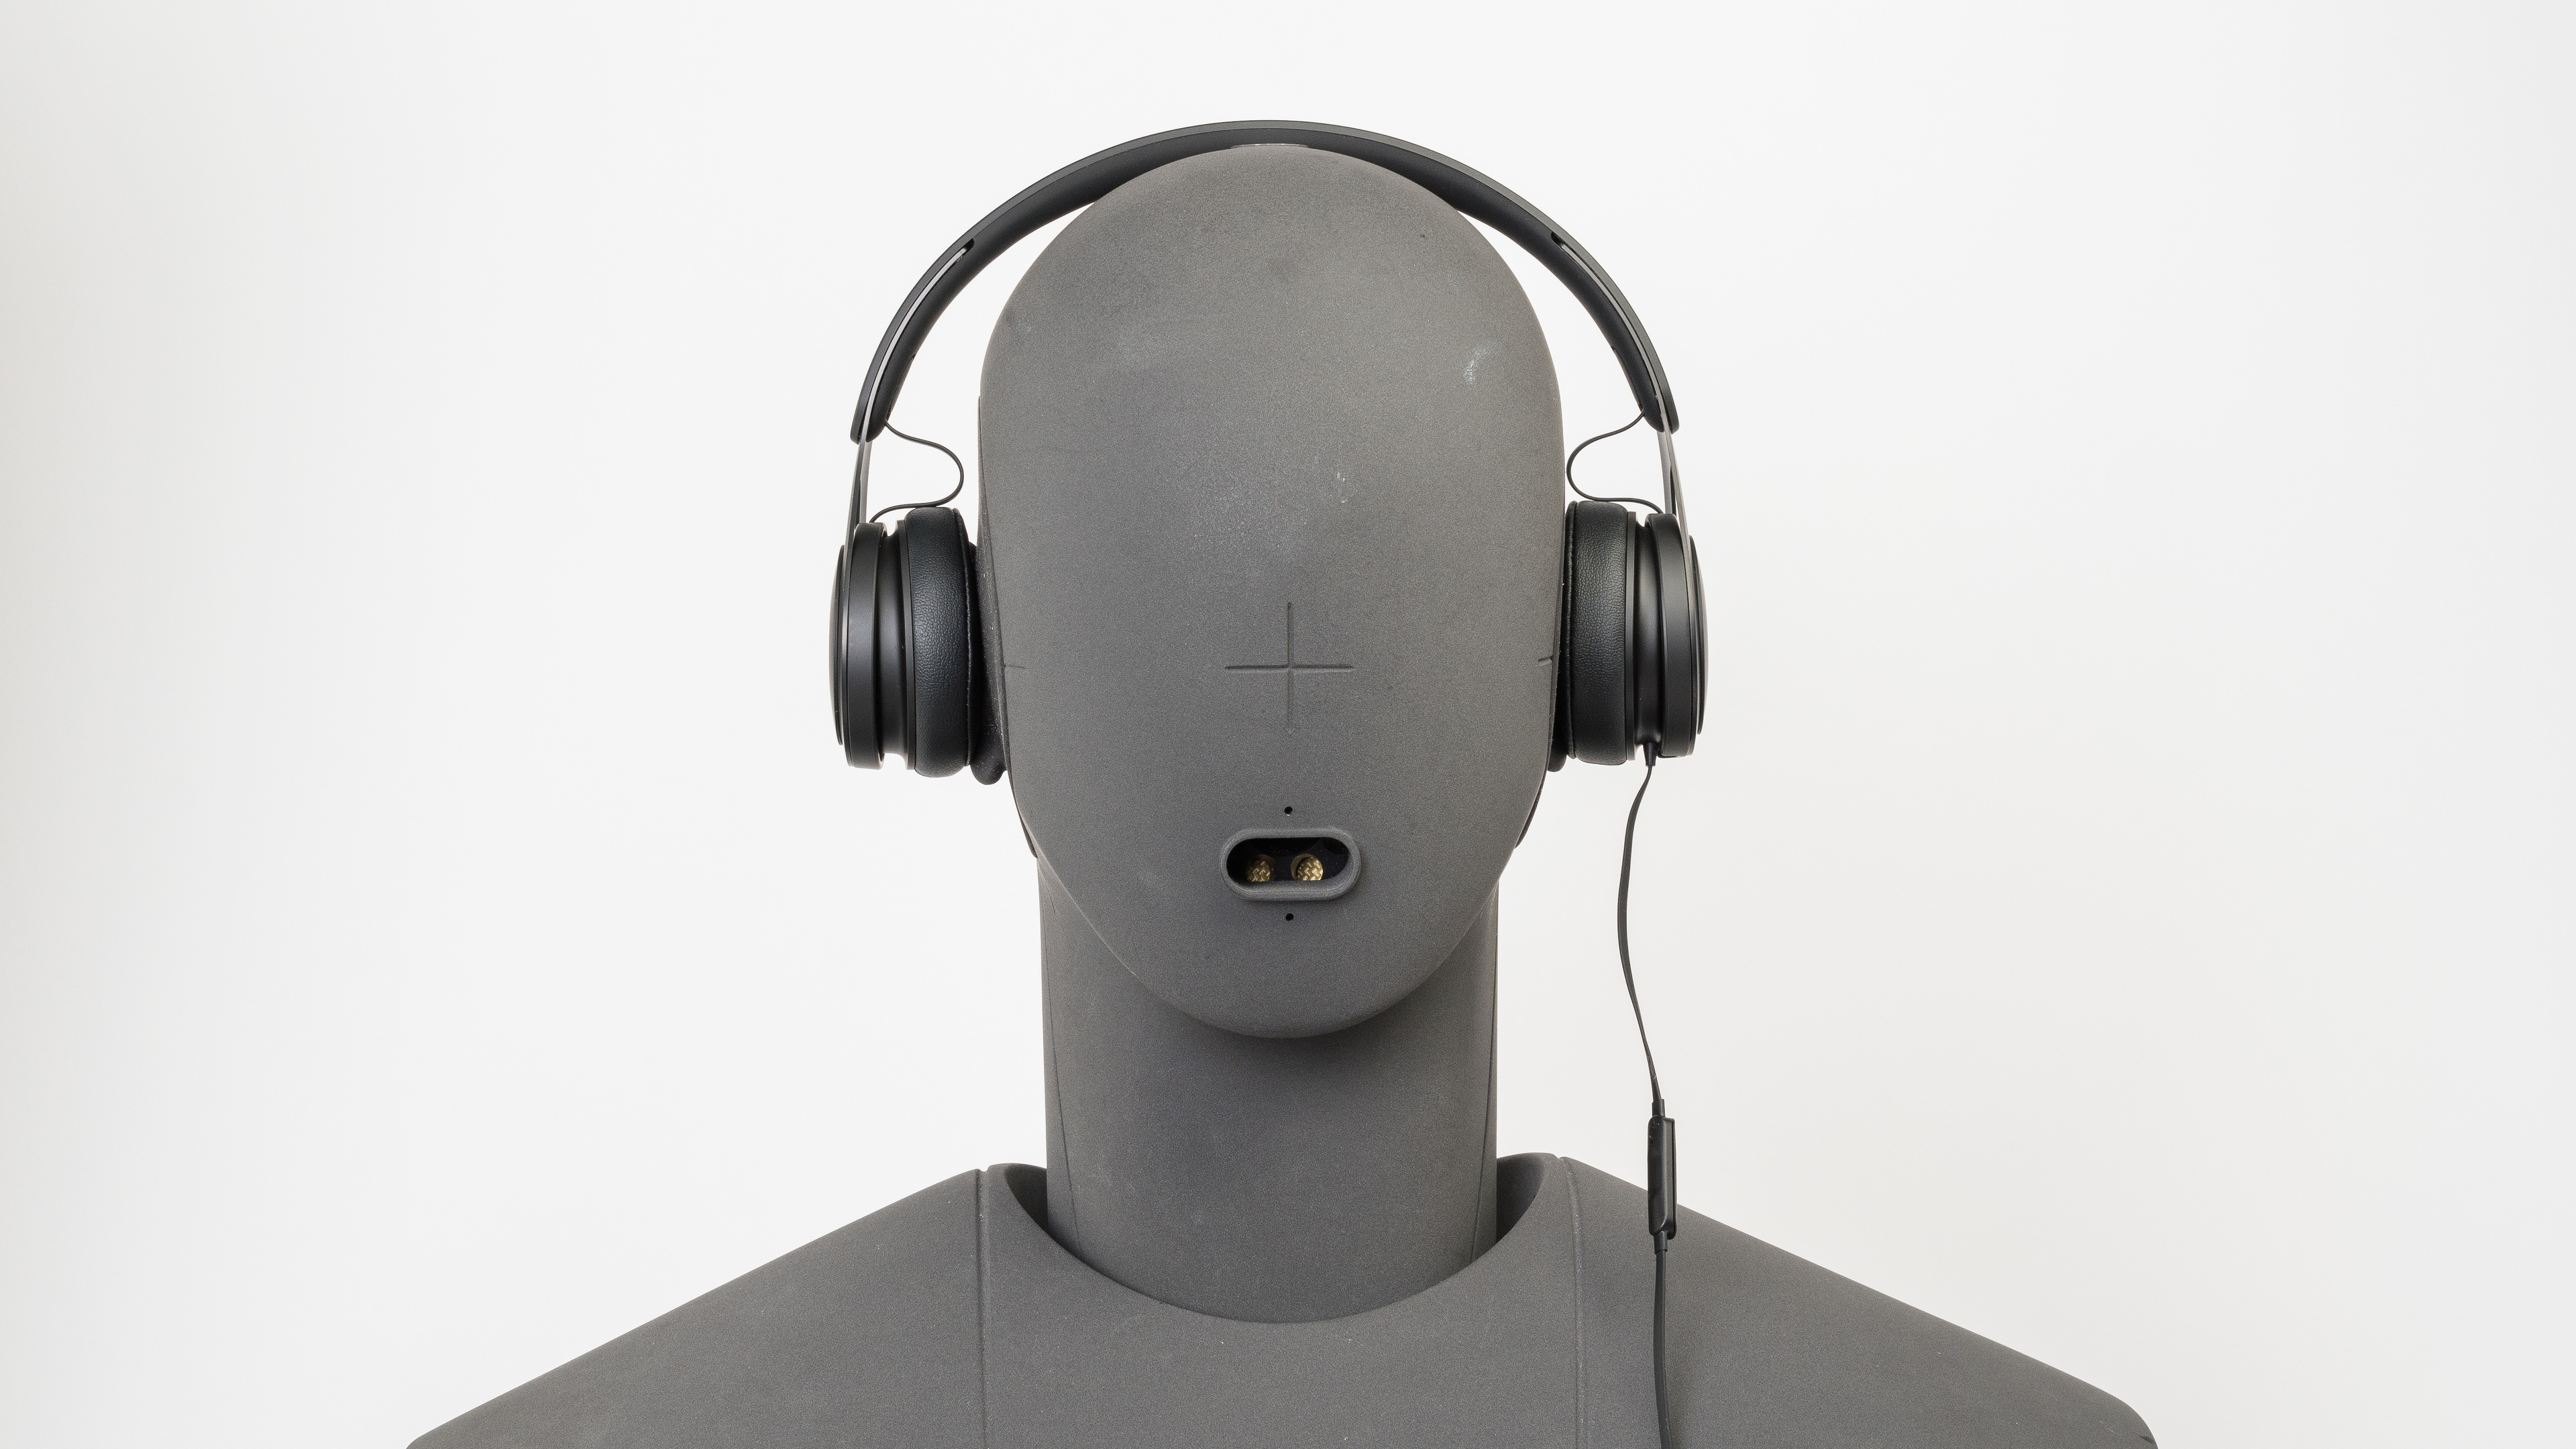 Beats Ep Headphones Wiring Diagram - Somurich.com on beats headphone cord replacement, apple headphone wire color diagram, beats headphone jack repair,